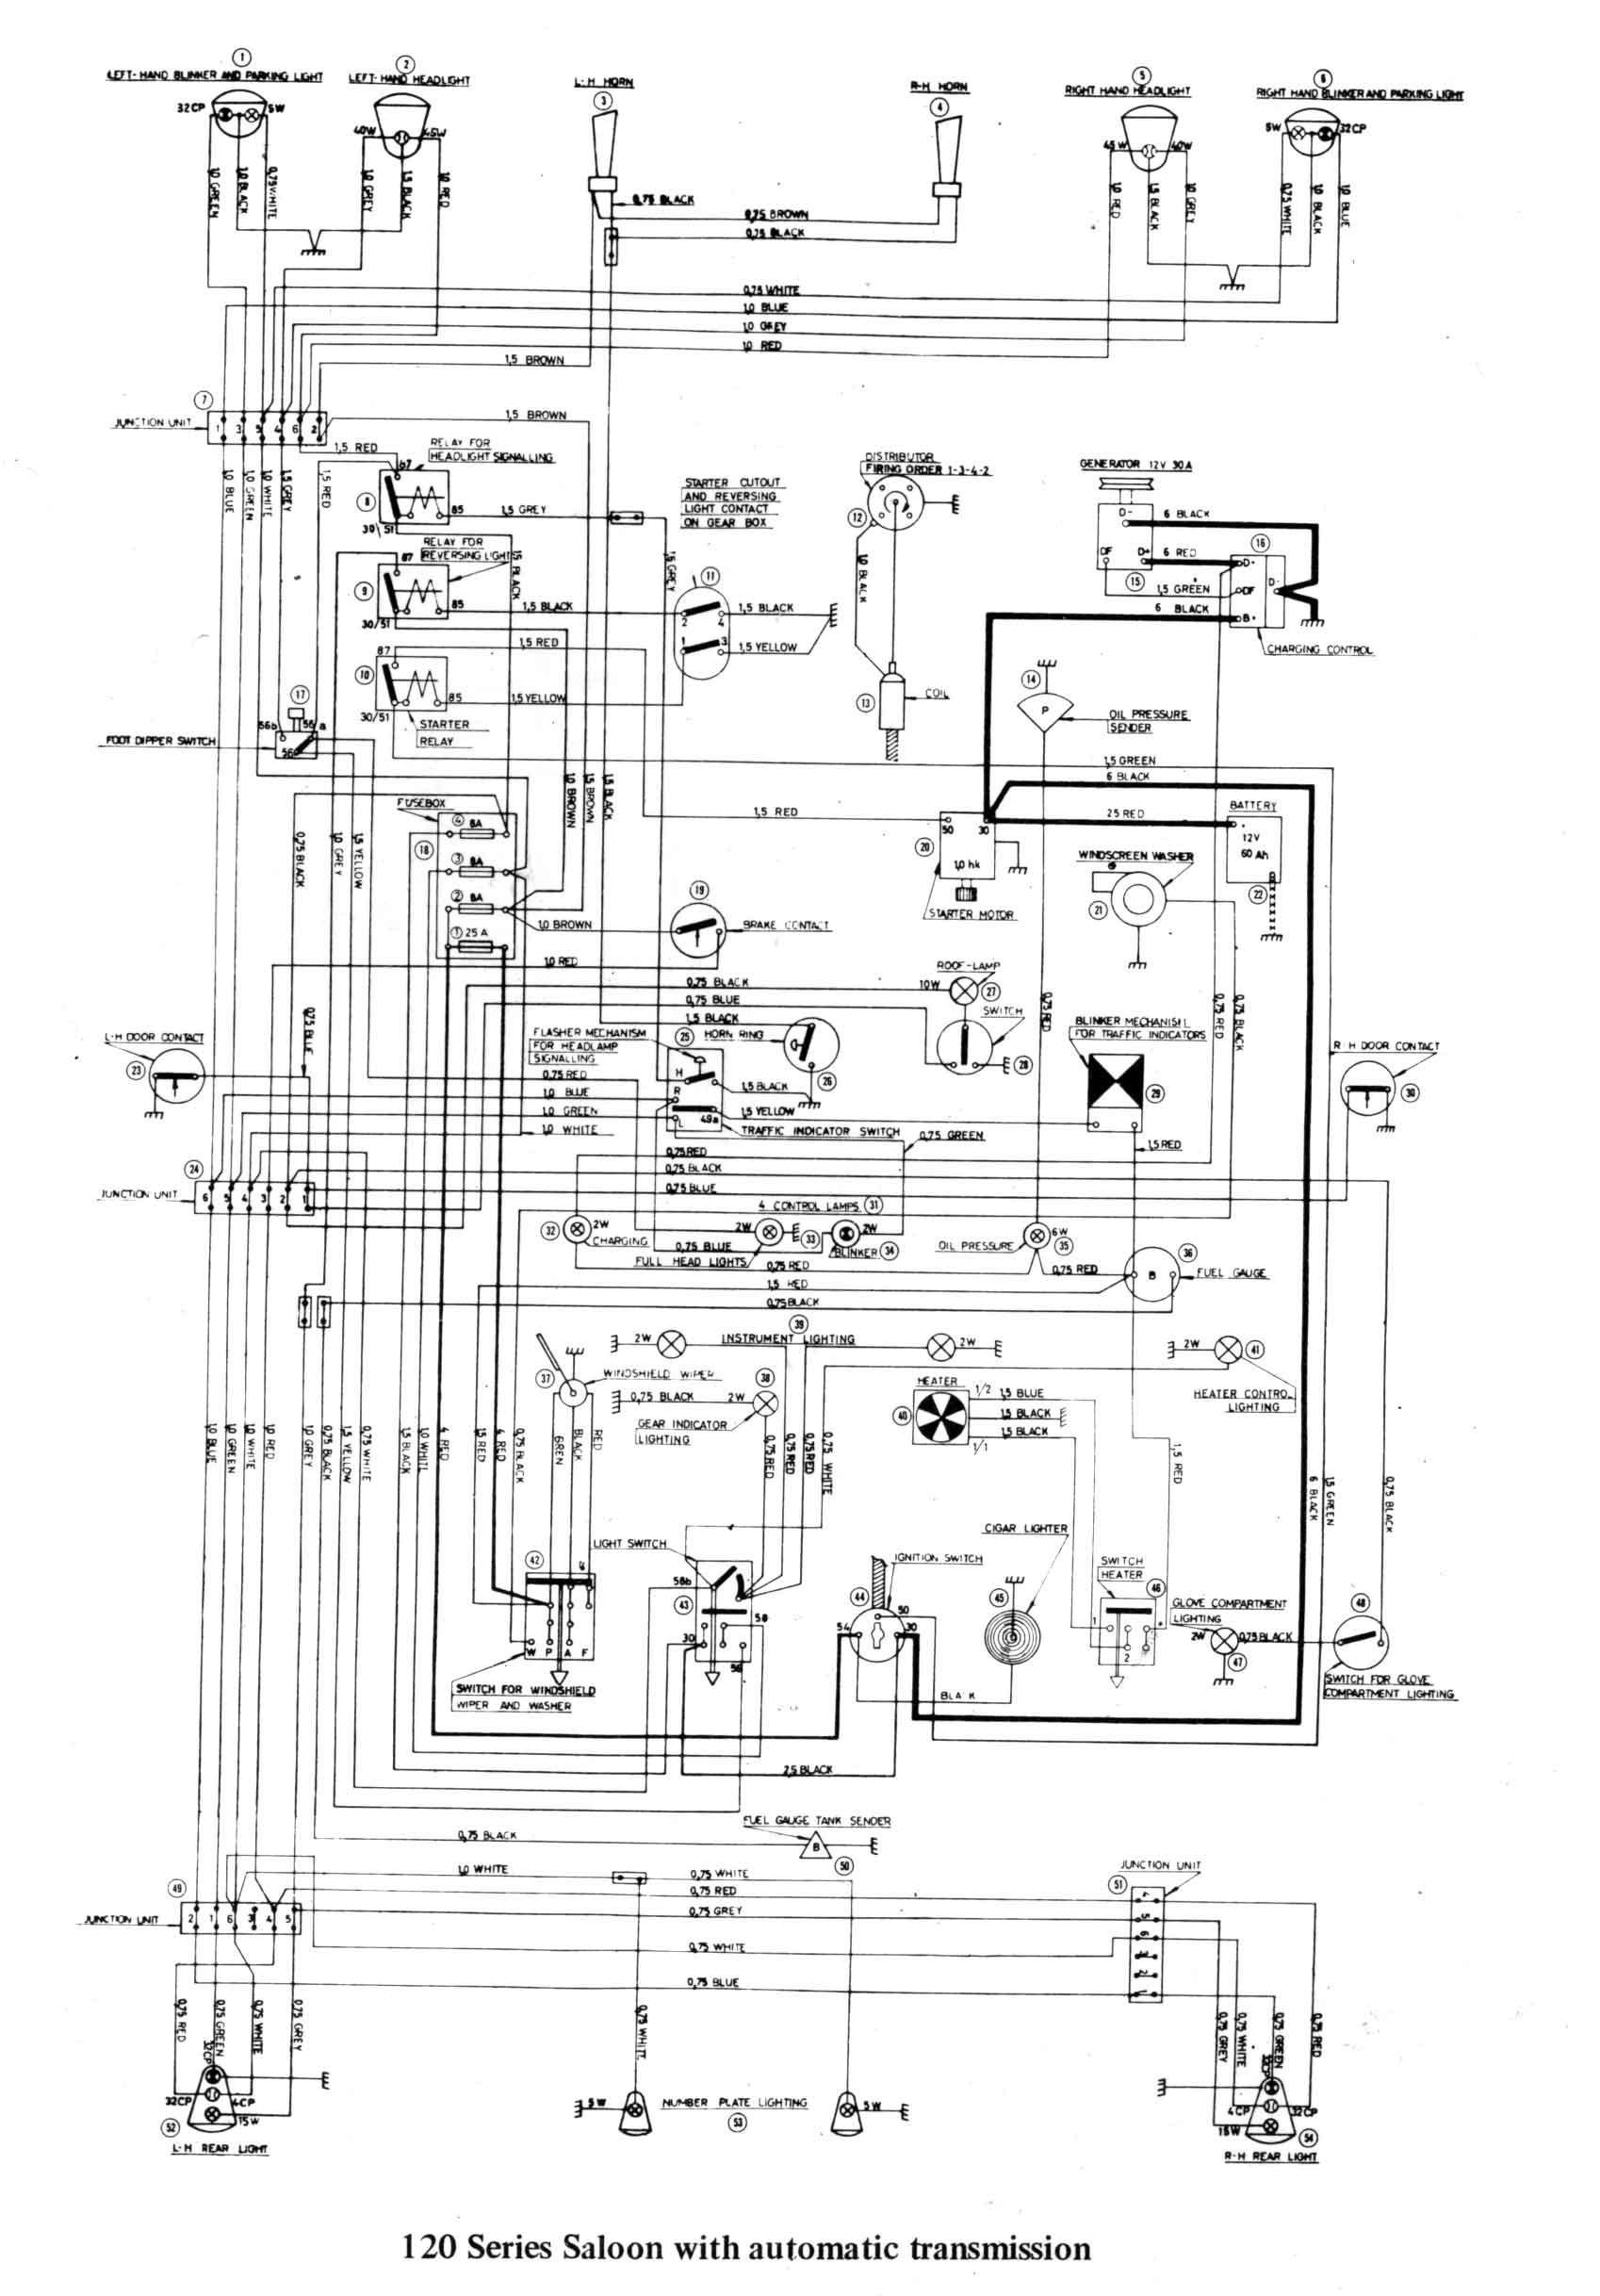 2005 volvo s40 engine diagram volvo v40 engine diagram my wiring rh detoxicrecenze com volvo s40 engine compartment diagram 2002 volvo s40 engine diagram